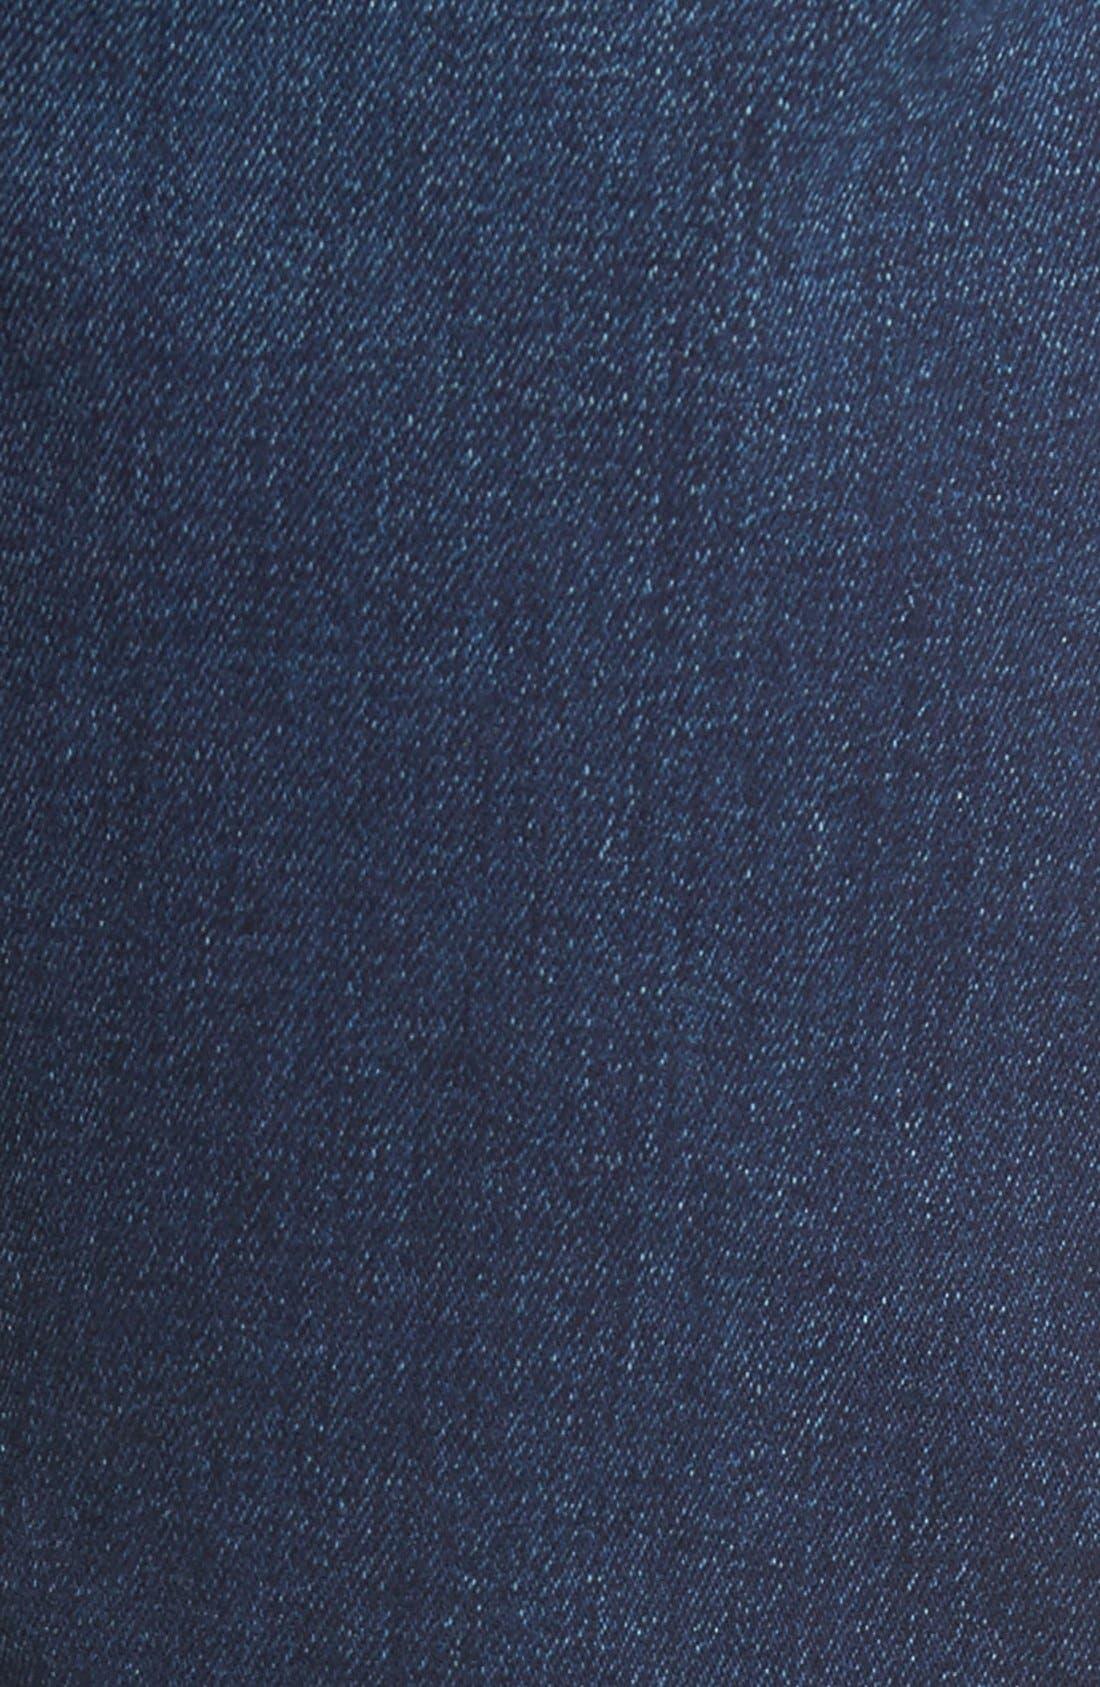 Slimmy Luxe Performance Slim Fit Jeans,                             Alternate thumbnail 5, color,                             Belfast